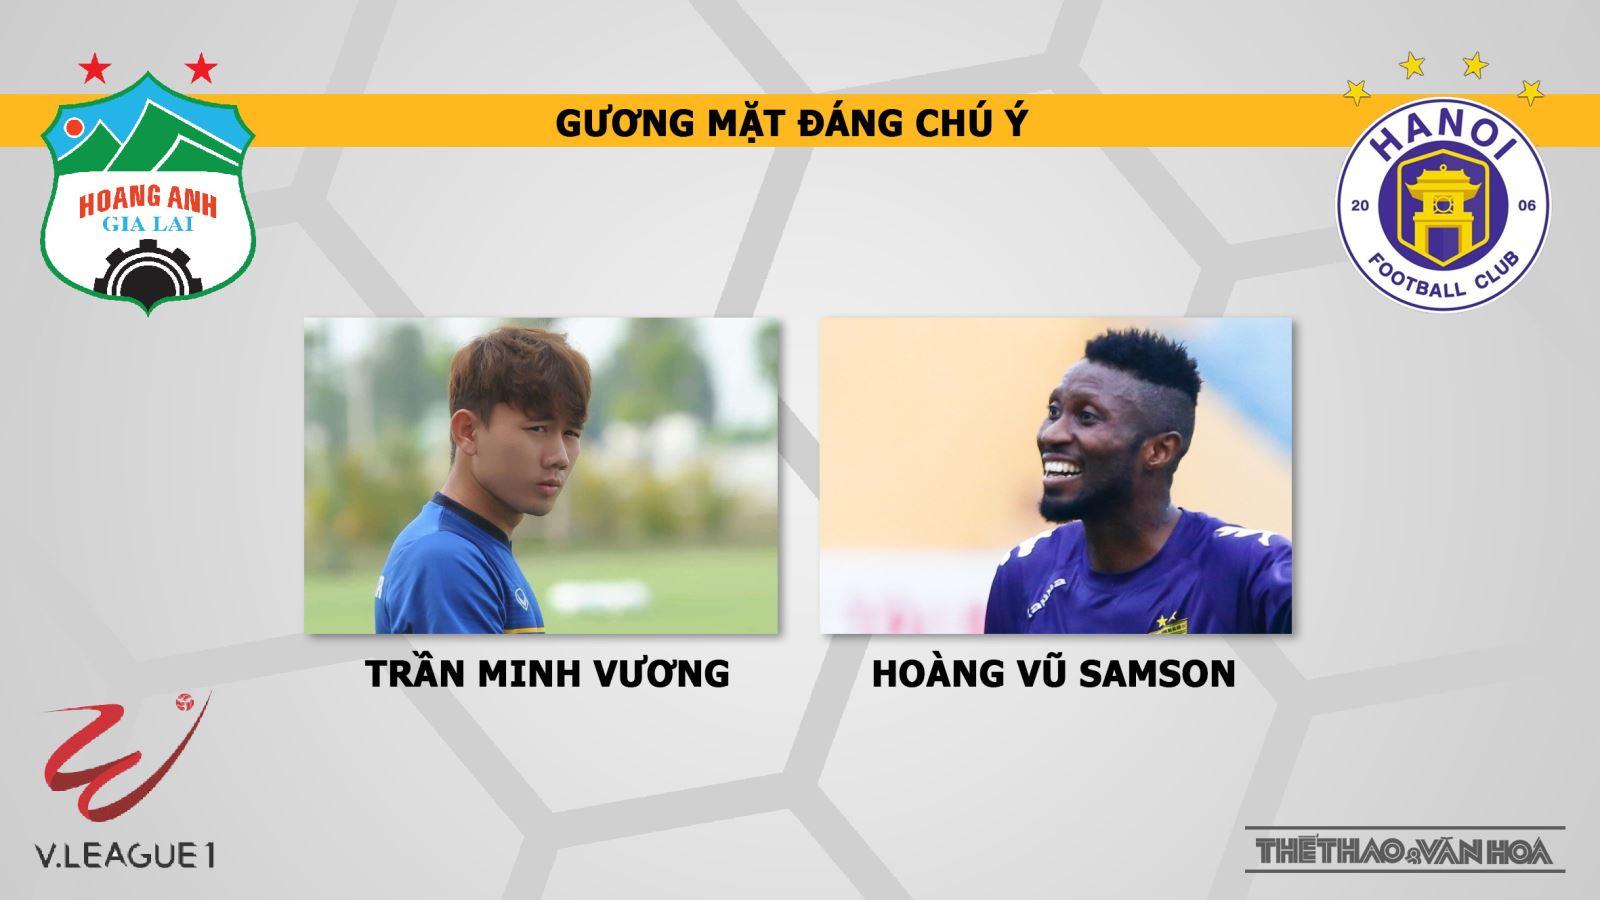 HAGL vs Hà Nội FC, trực tiếp HAGL vs Hà Nội FC, trực tiếp bóng đá, V-League 2019, HAGL, Hà Nội FC